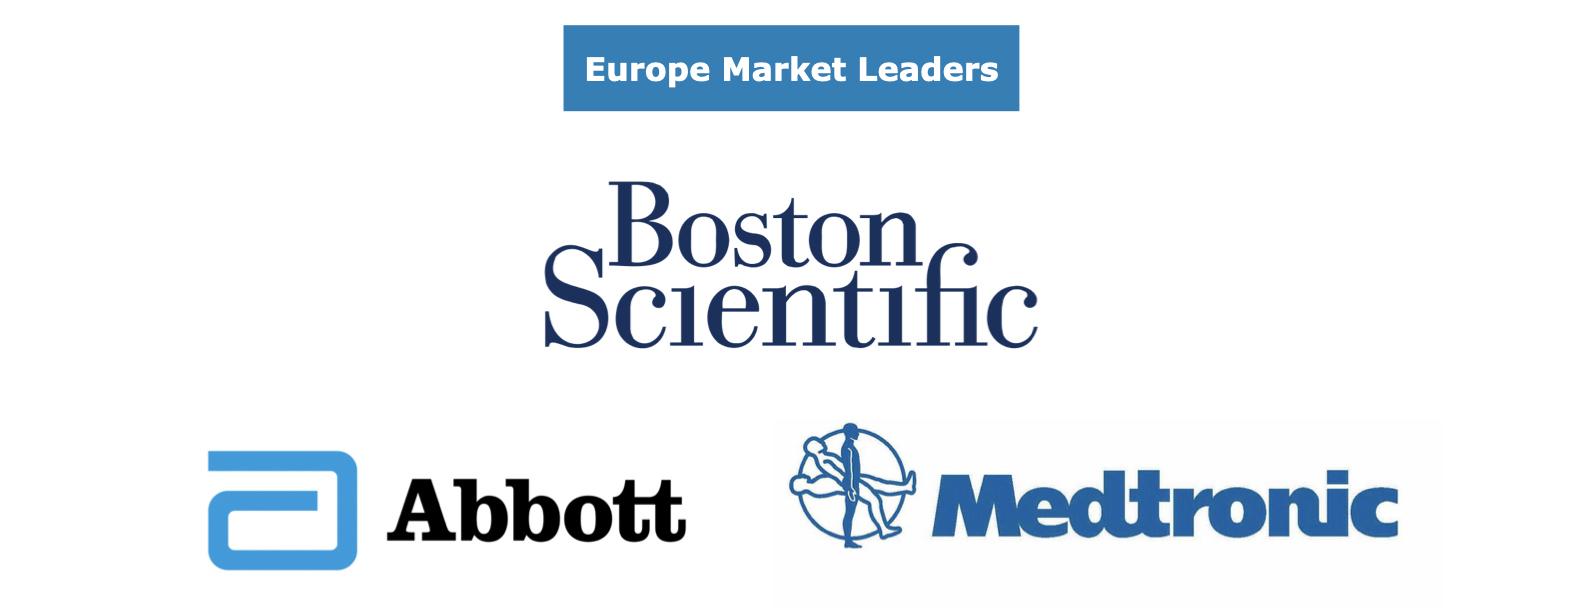 EU Interventional Cardiology Market Share Leaders